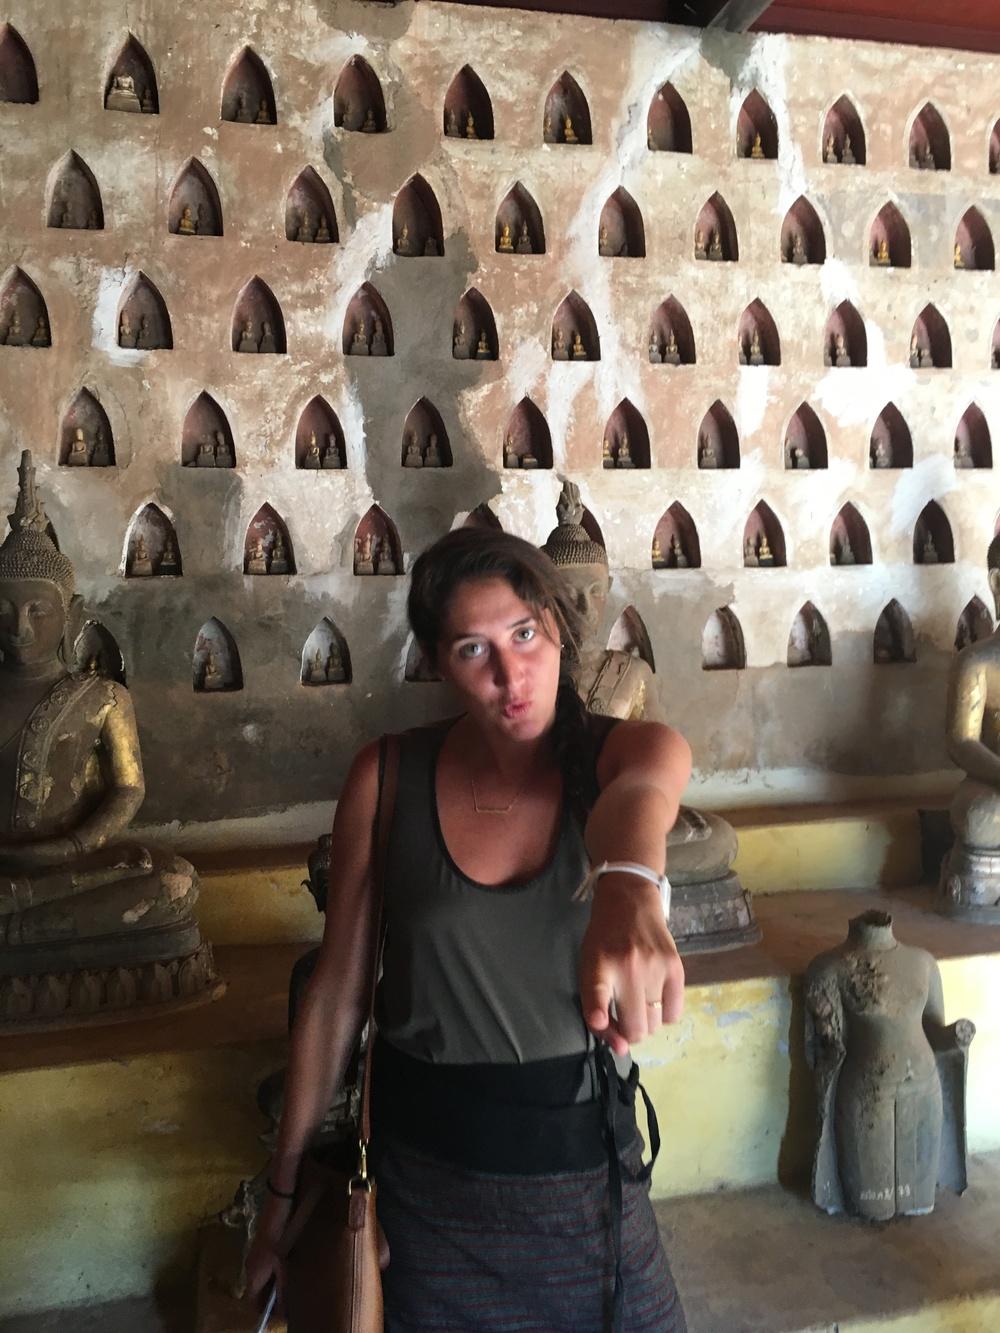 Buddha wants you...